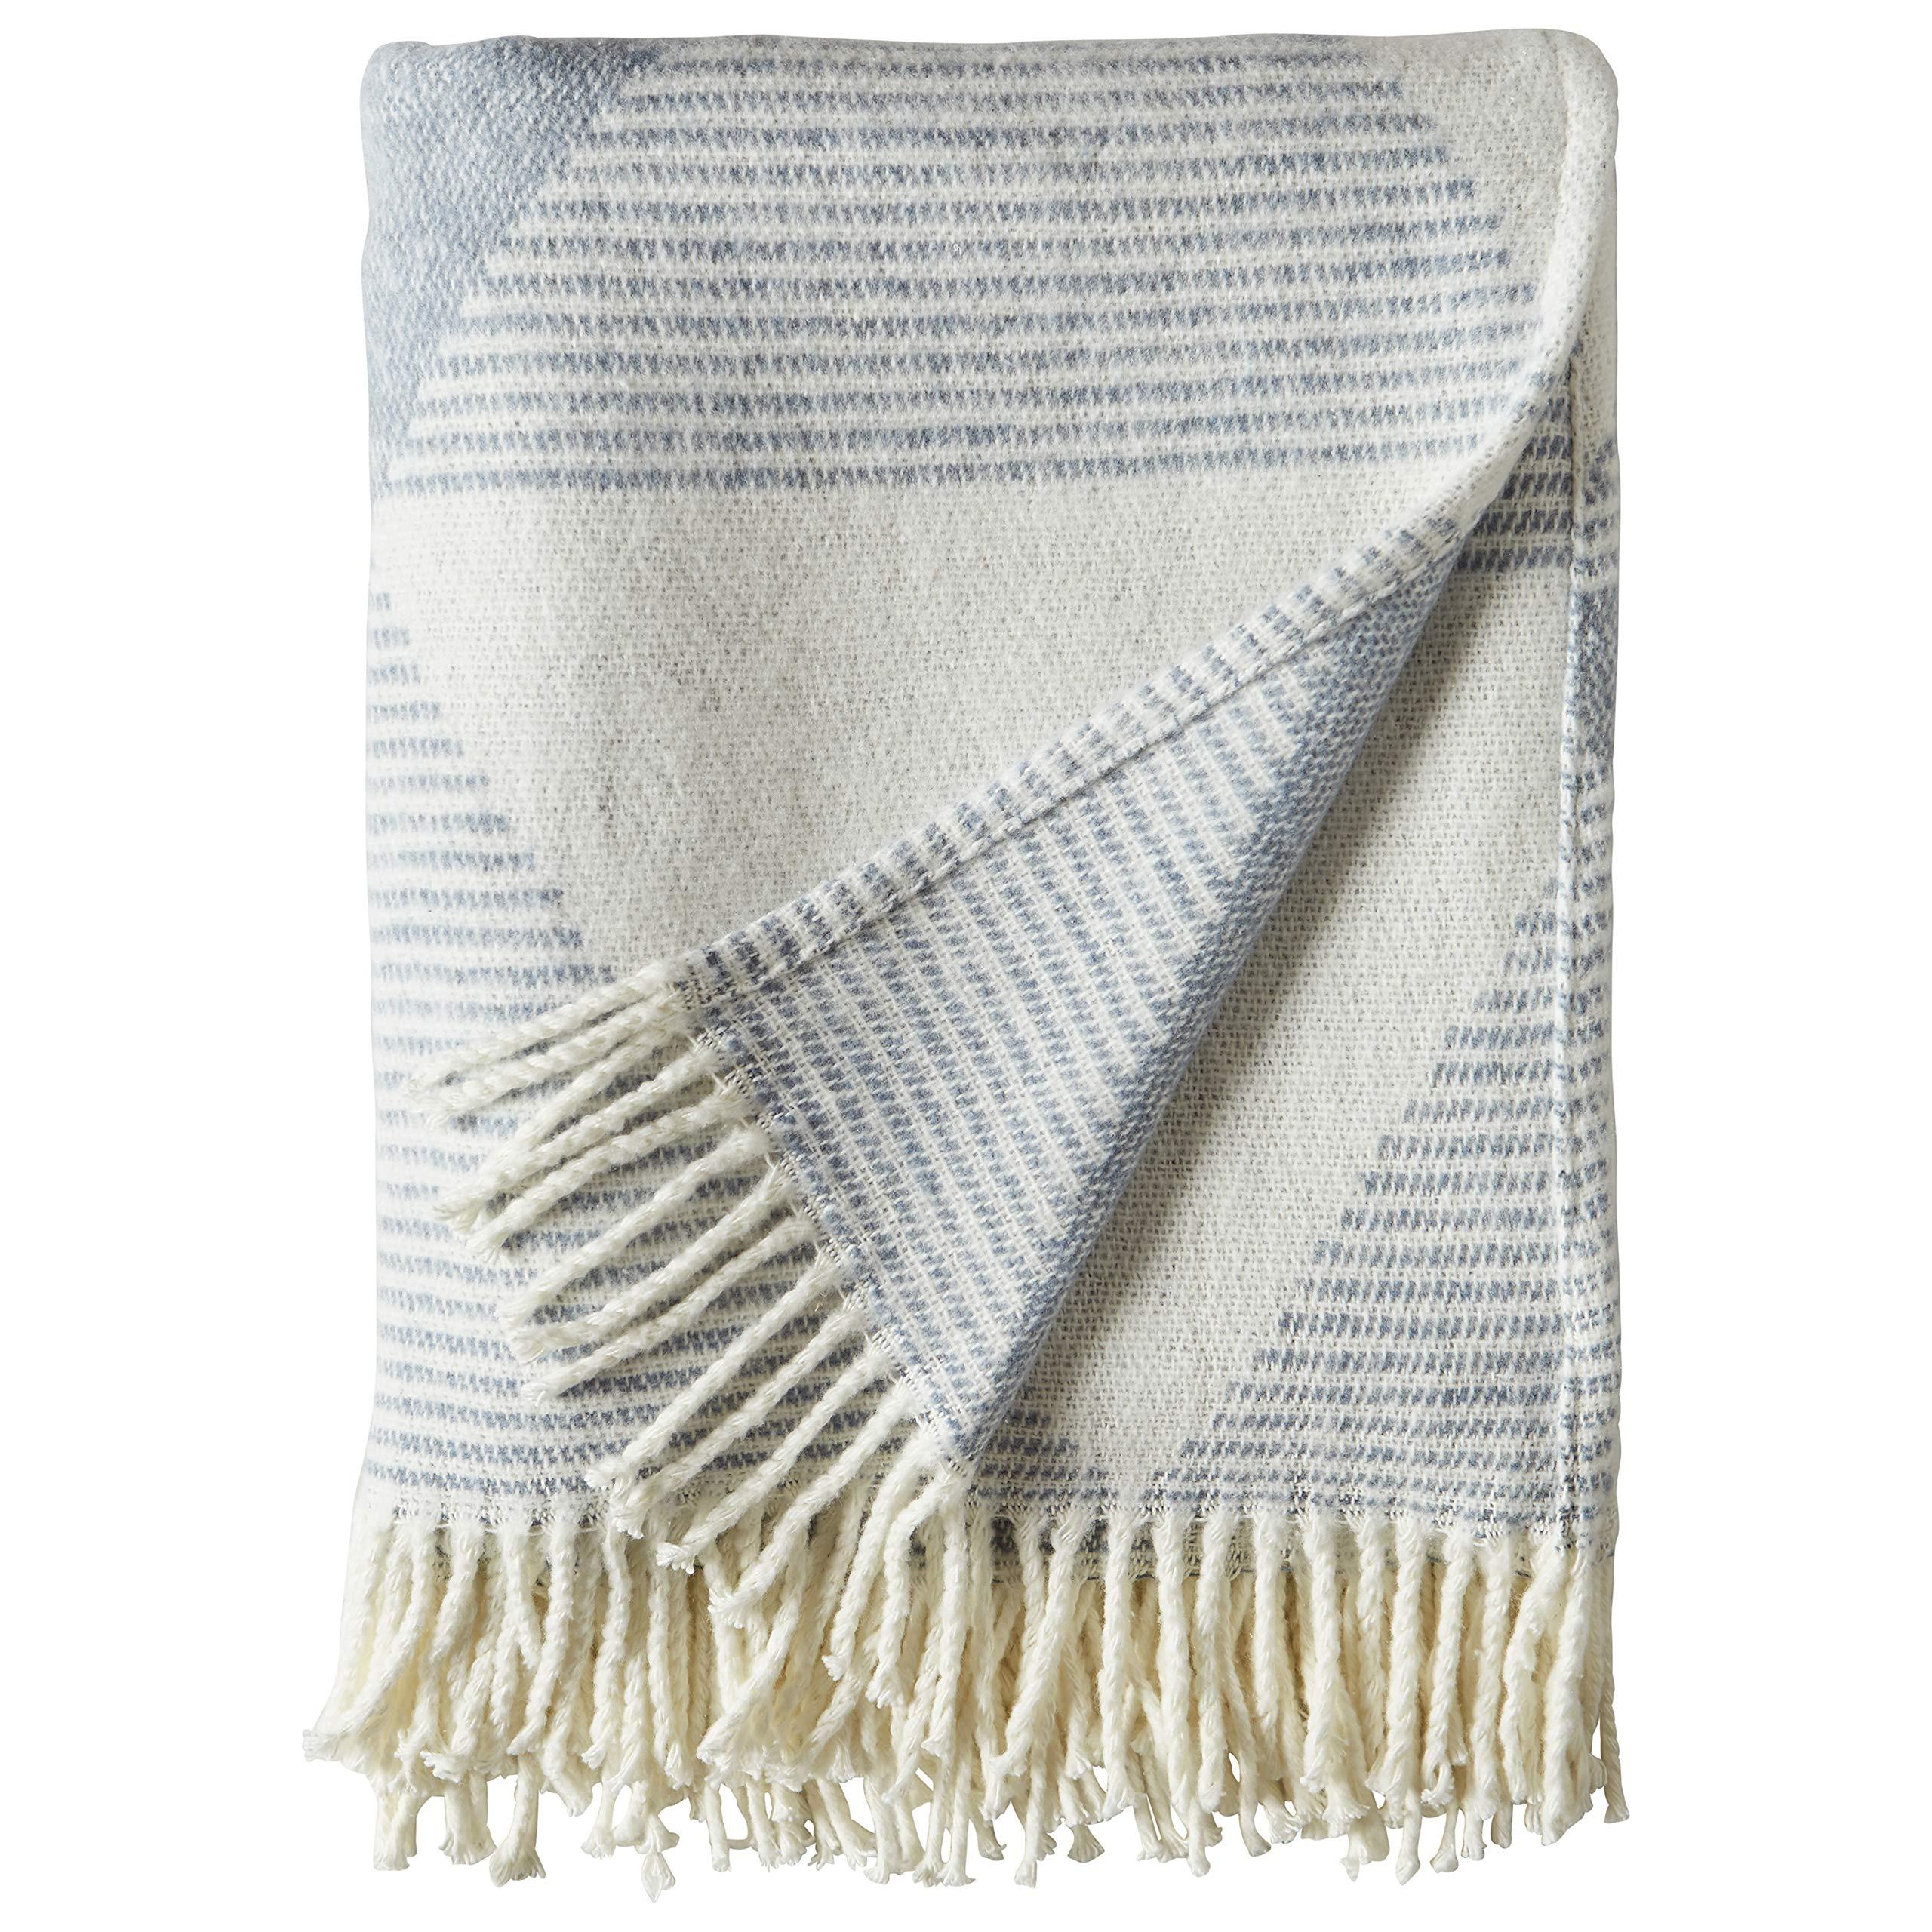 80 x 60 Inch Grey Rivet Chenille Knit Tassel Throw Blanket